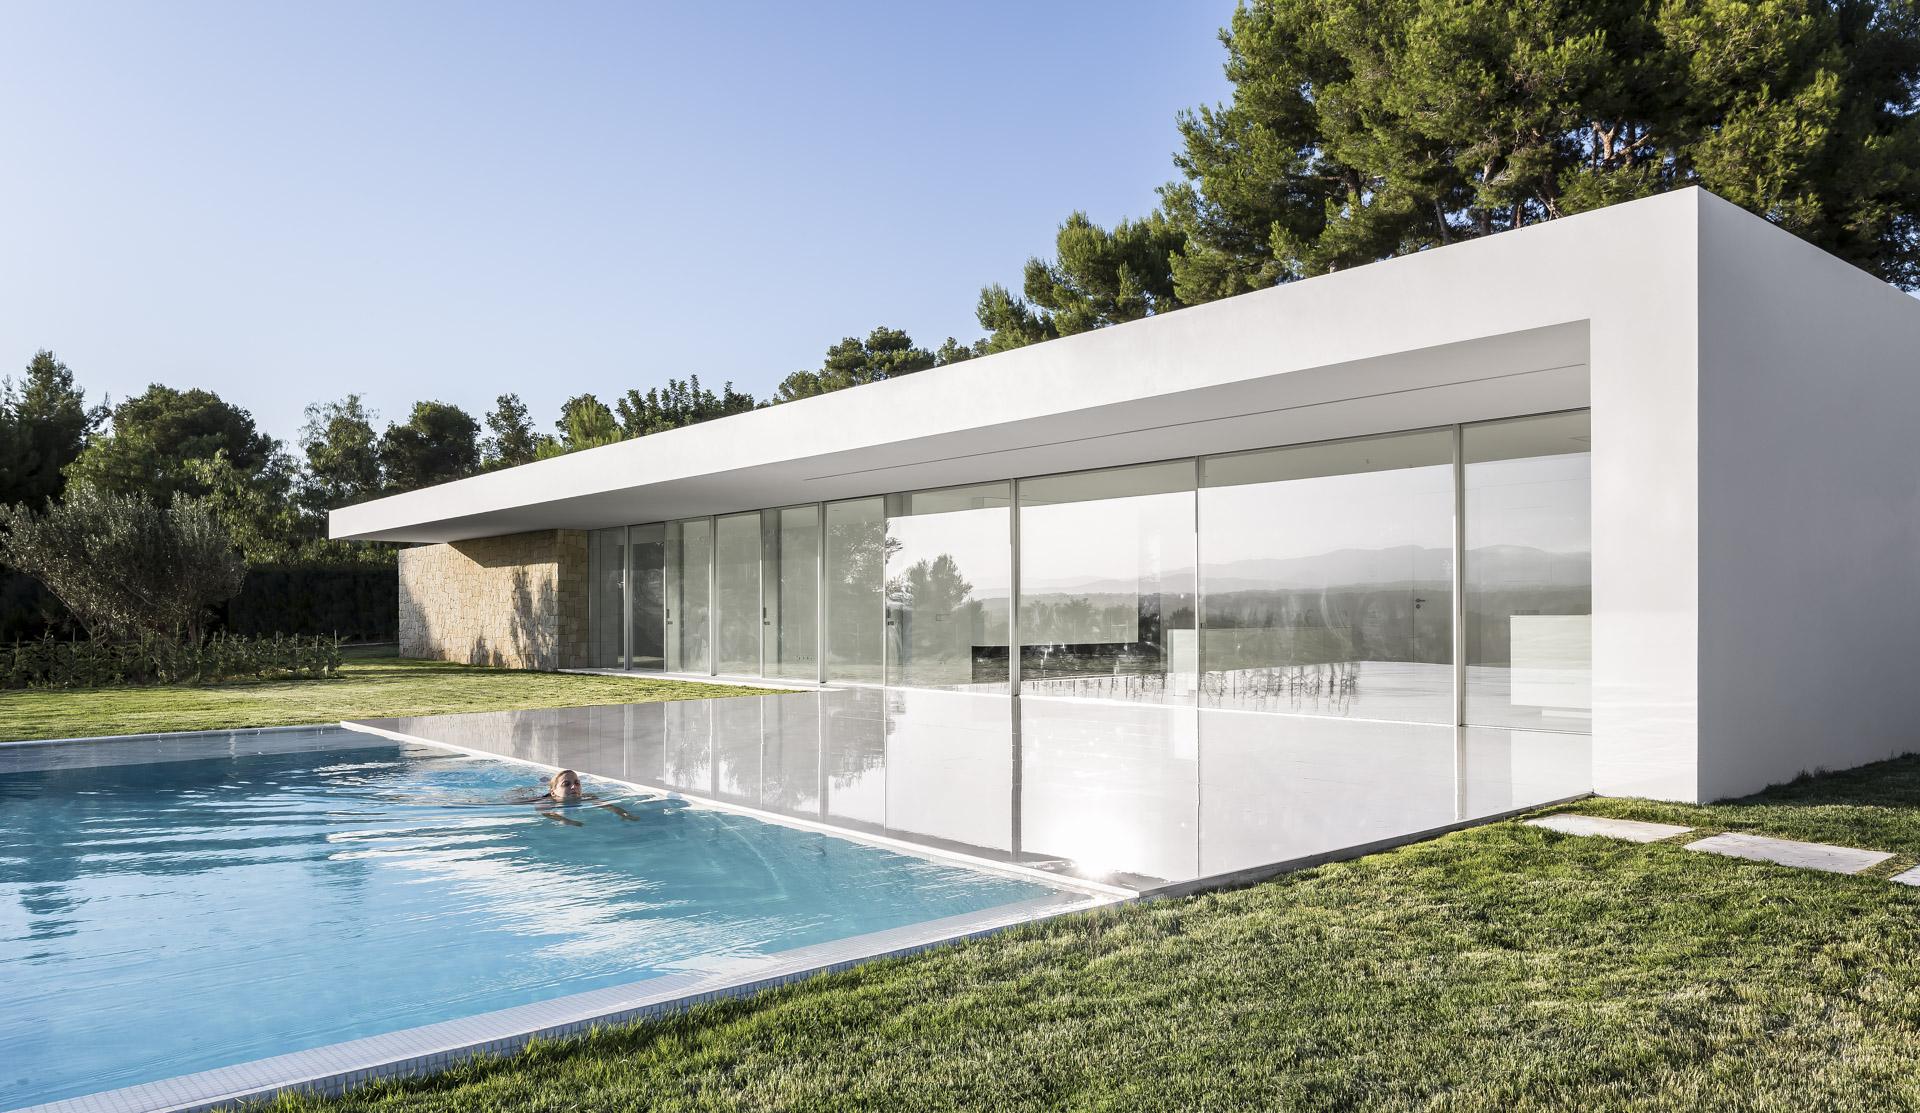 fotografia-arquitectura-valencia-german-cabo-gallardo-llopis-villamarchante-vivienda-42